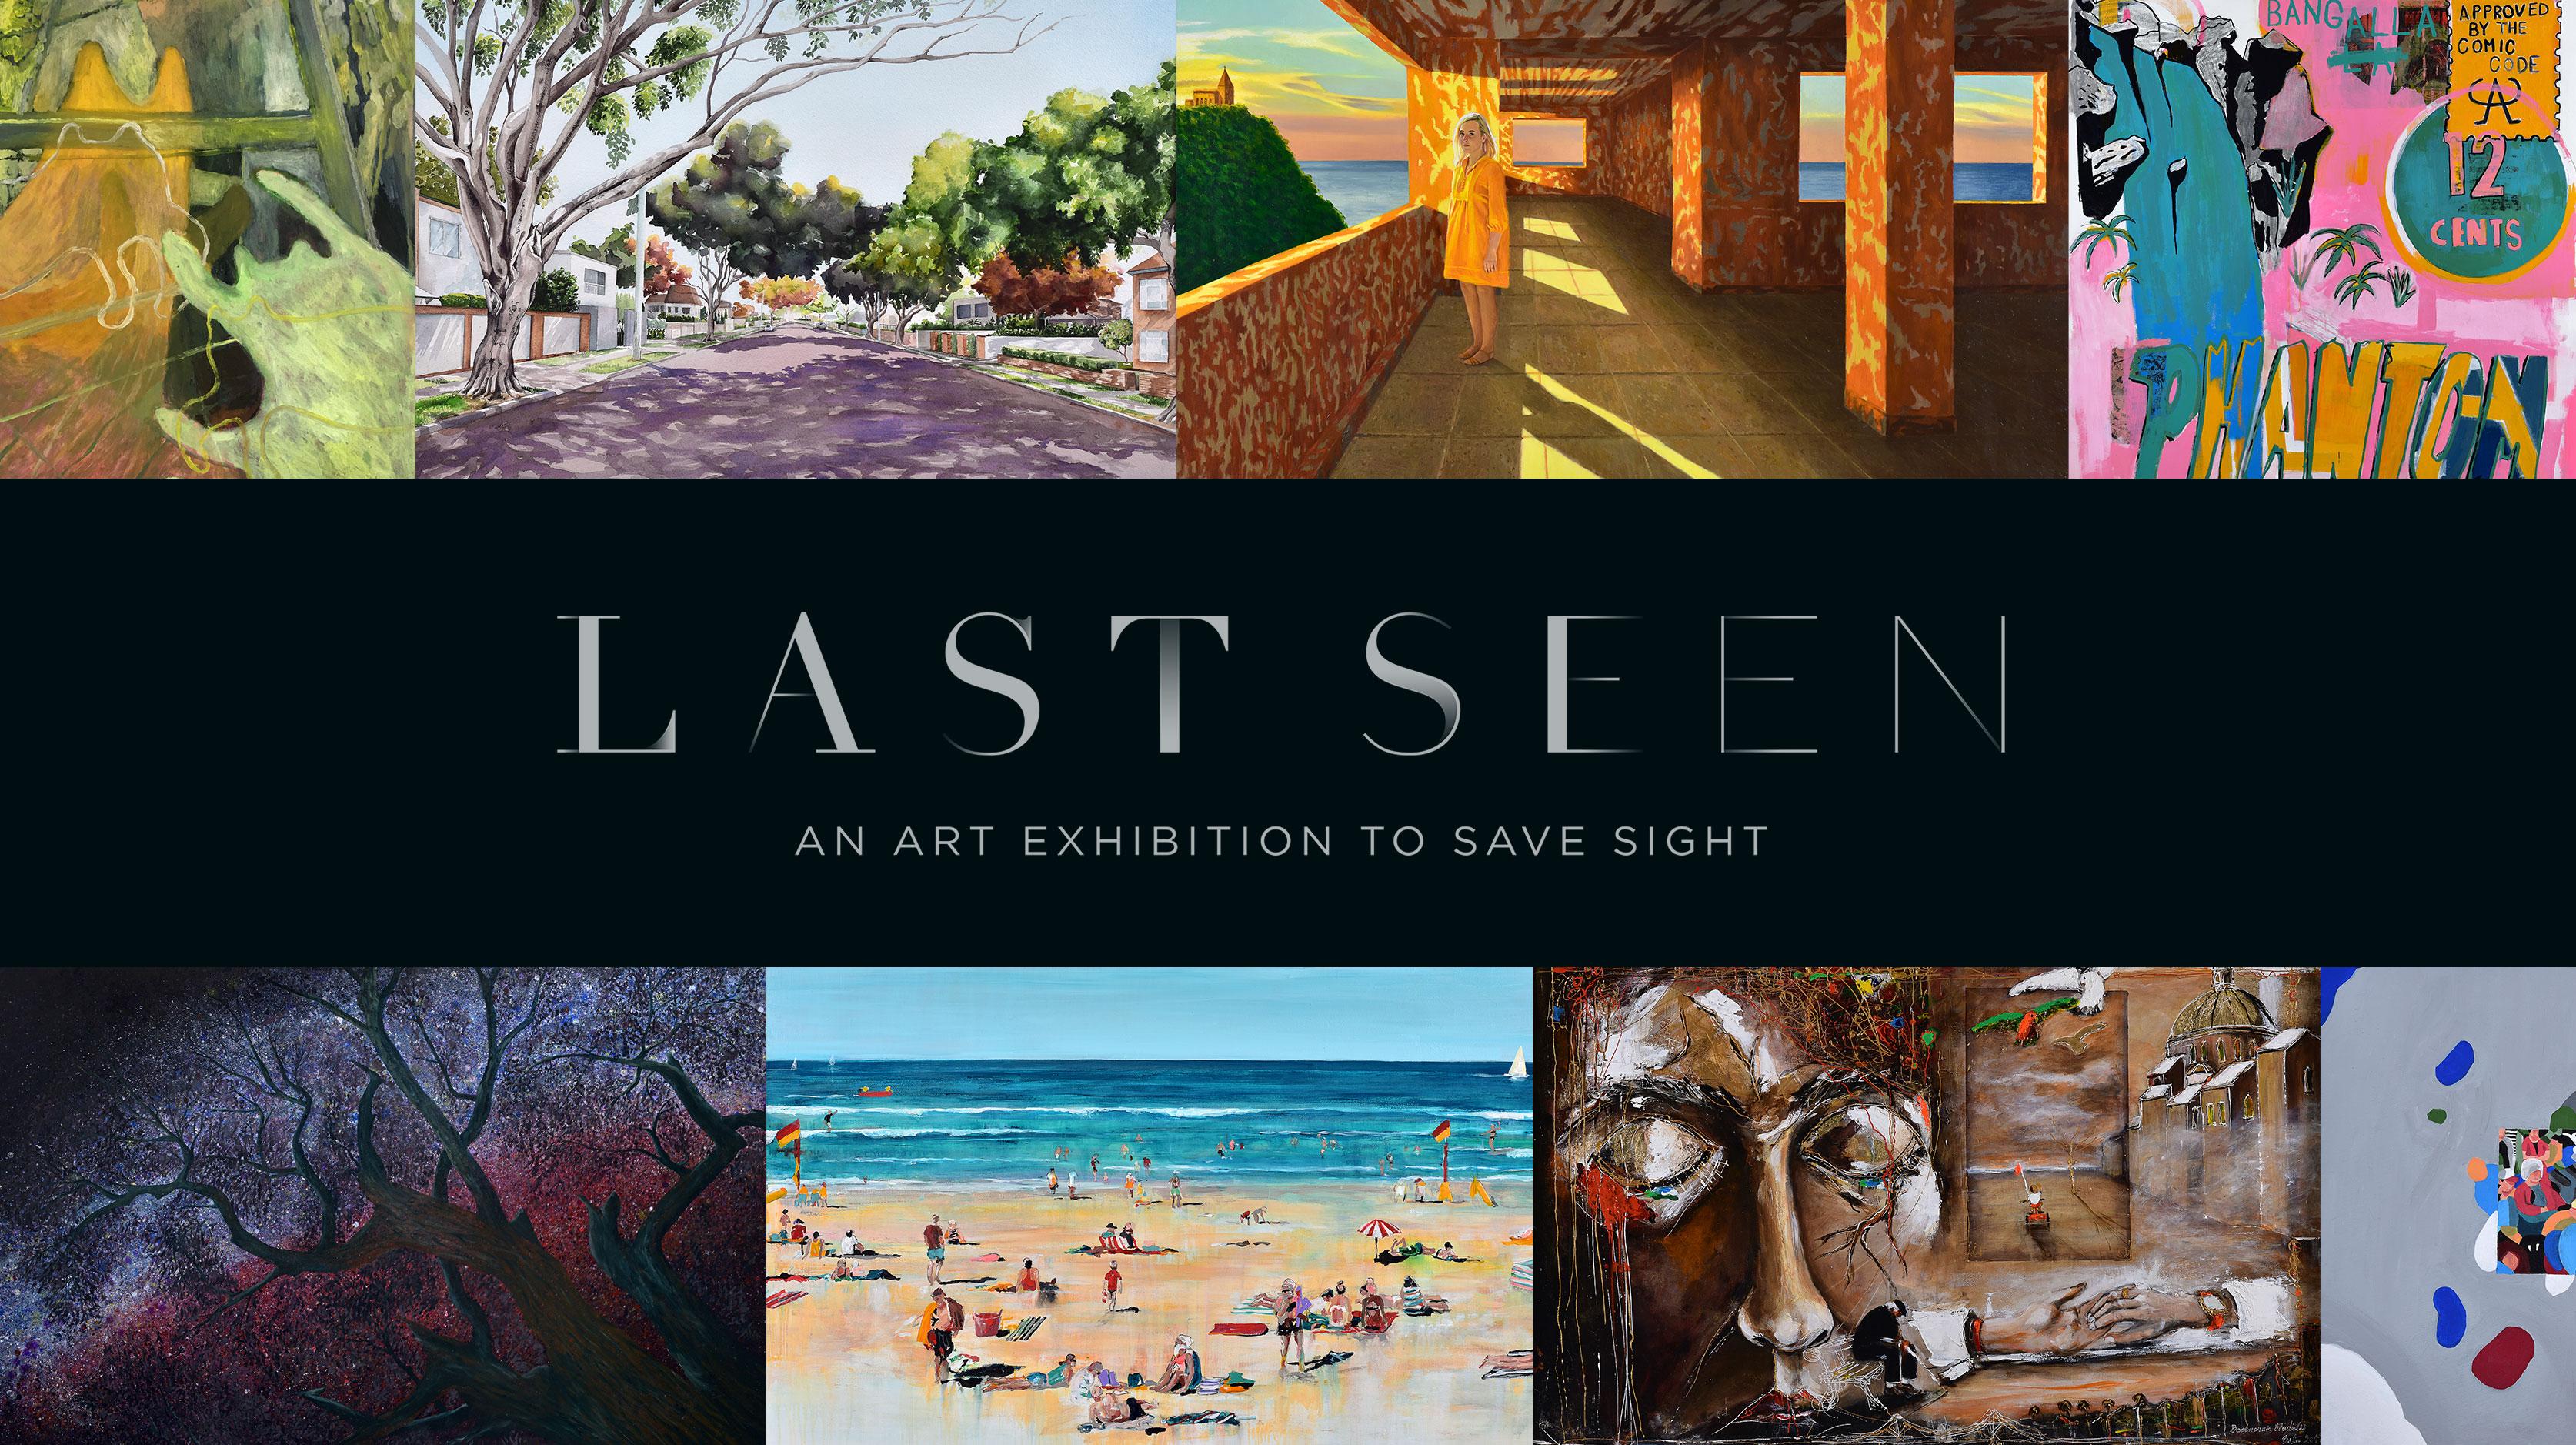 The Queensland Eye Institute Foundation Holds 'LAST SEEN' Art Exhibition via Publicis Worldwide